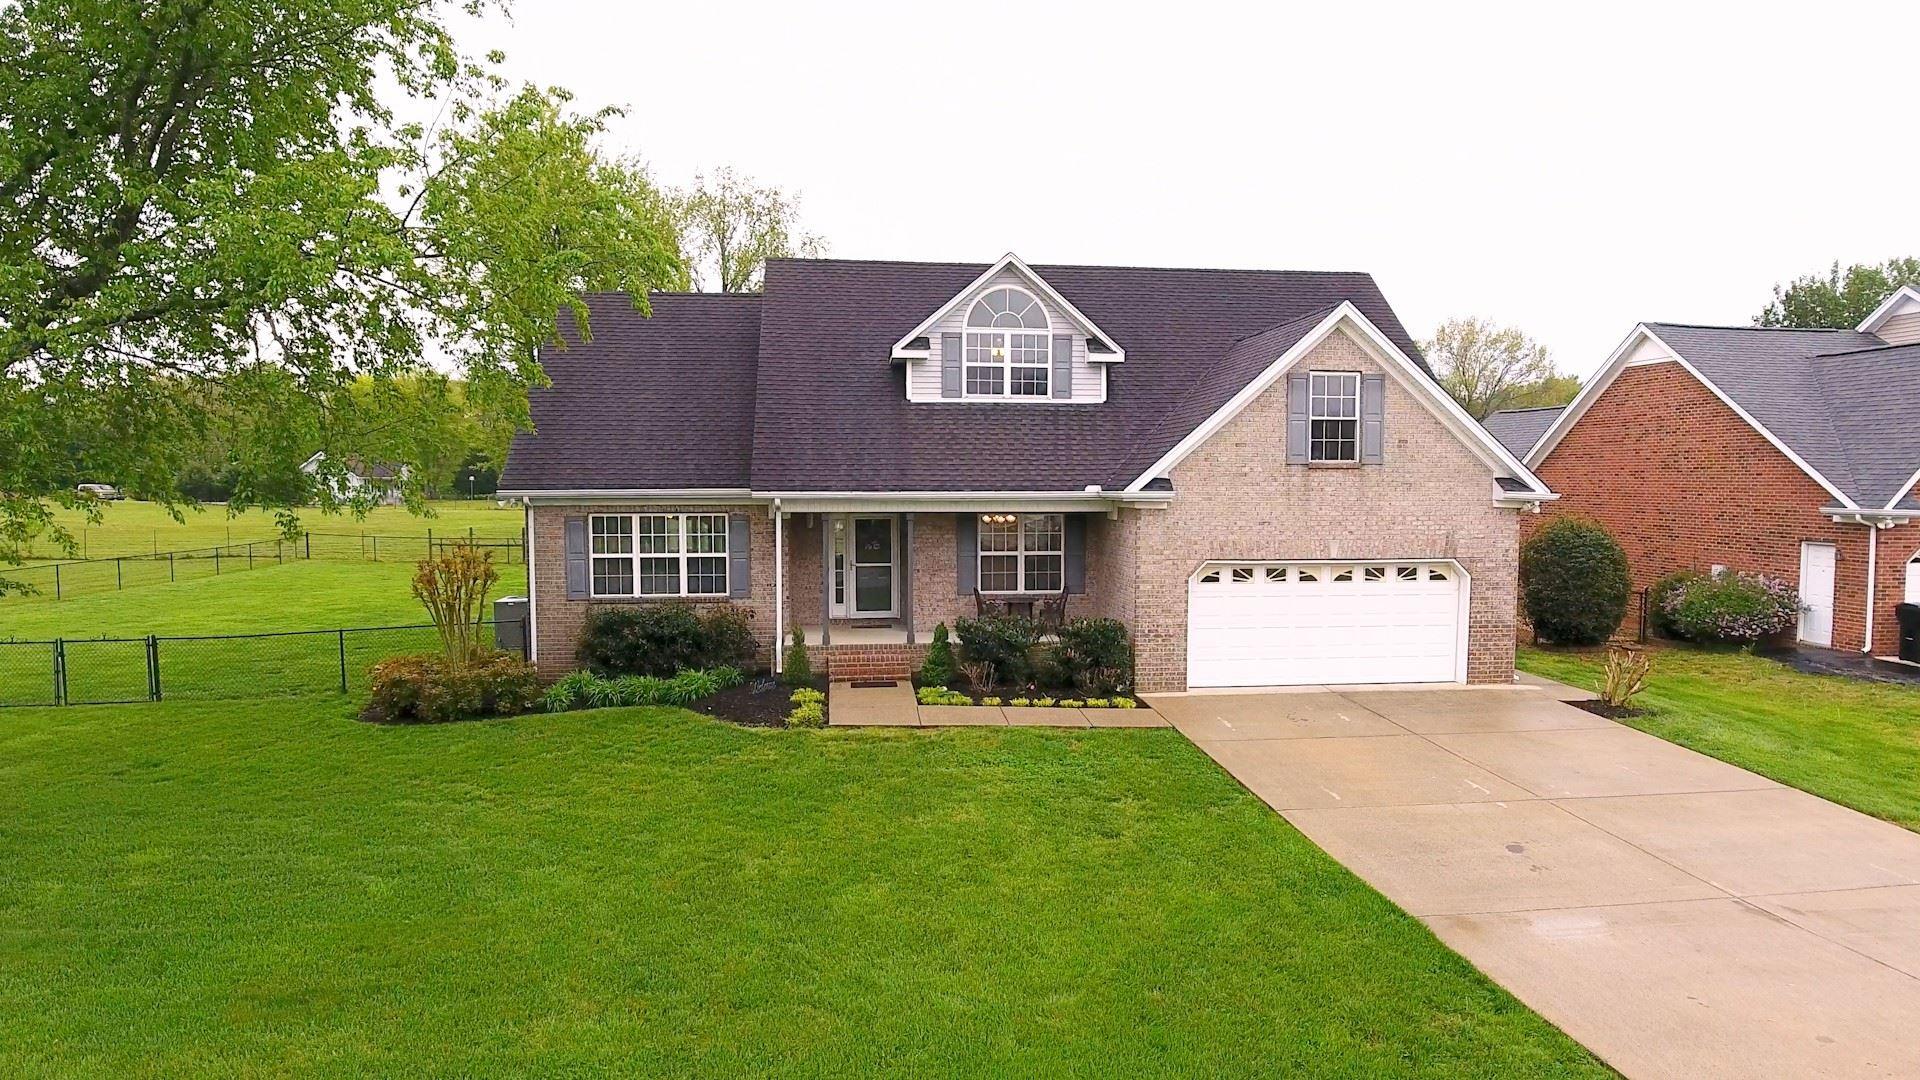 Photo of 208 Arkow Ln, Murfreesboro, TN 37128 (MLS # 2249904)